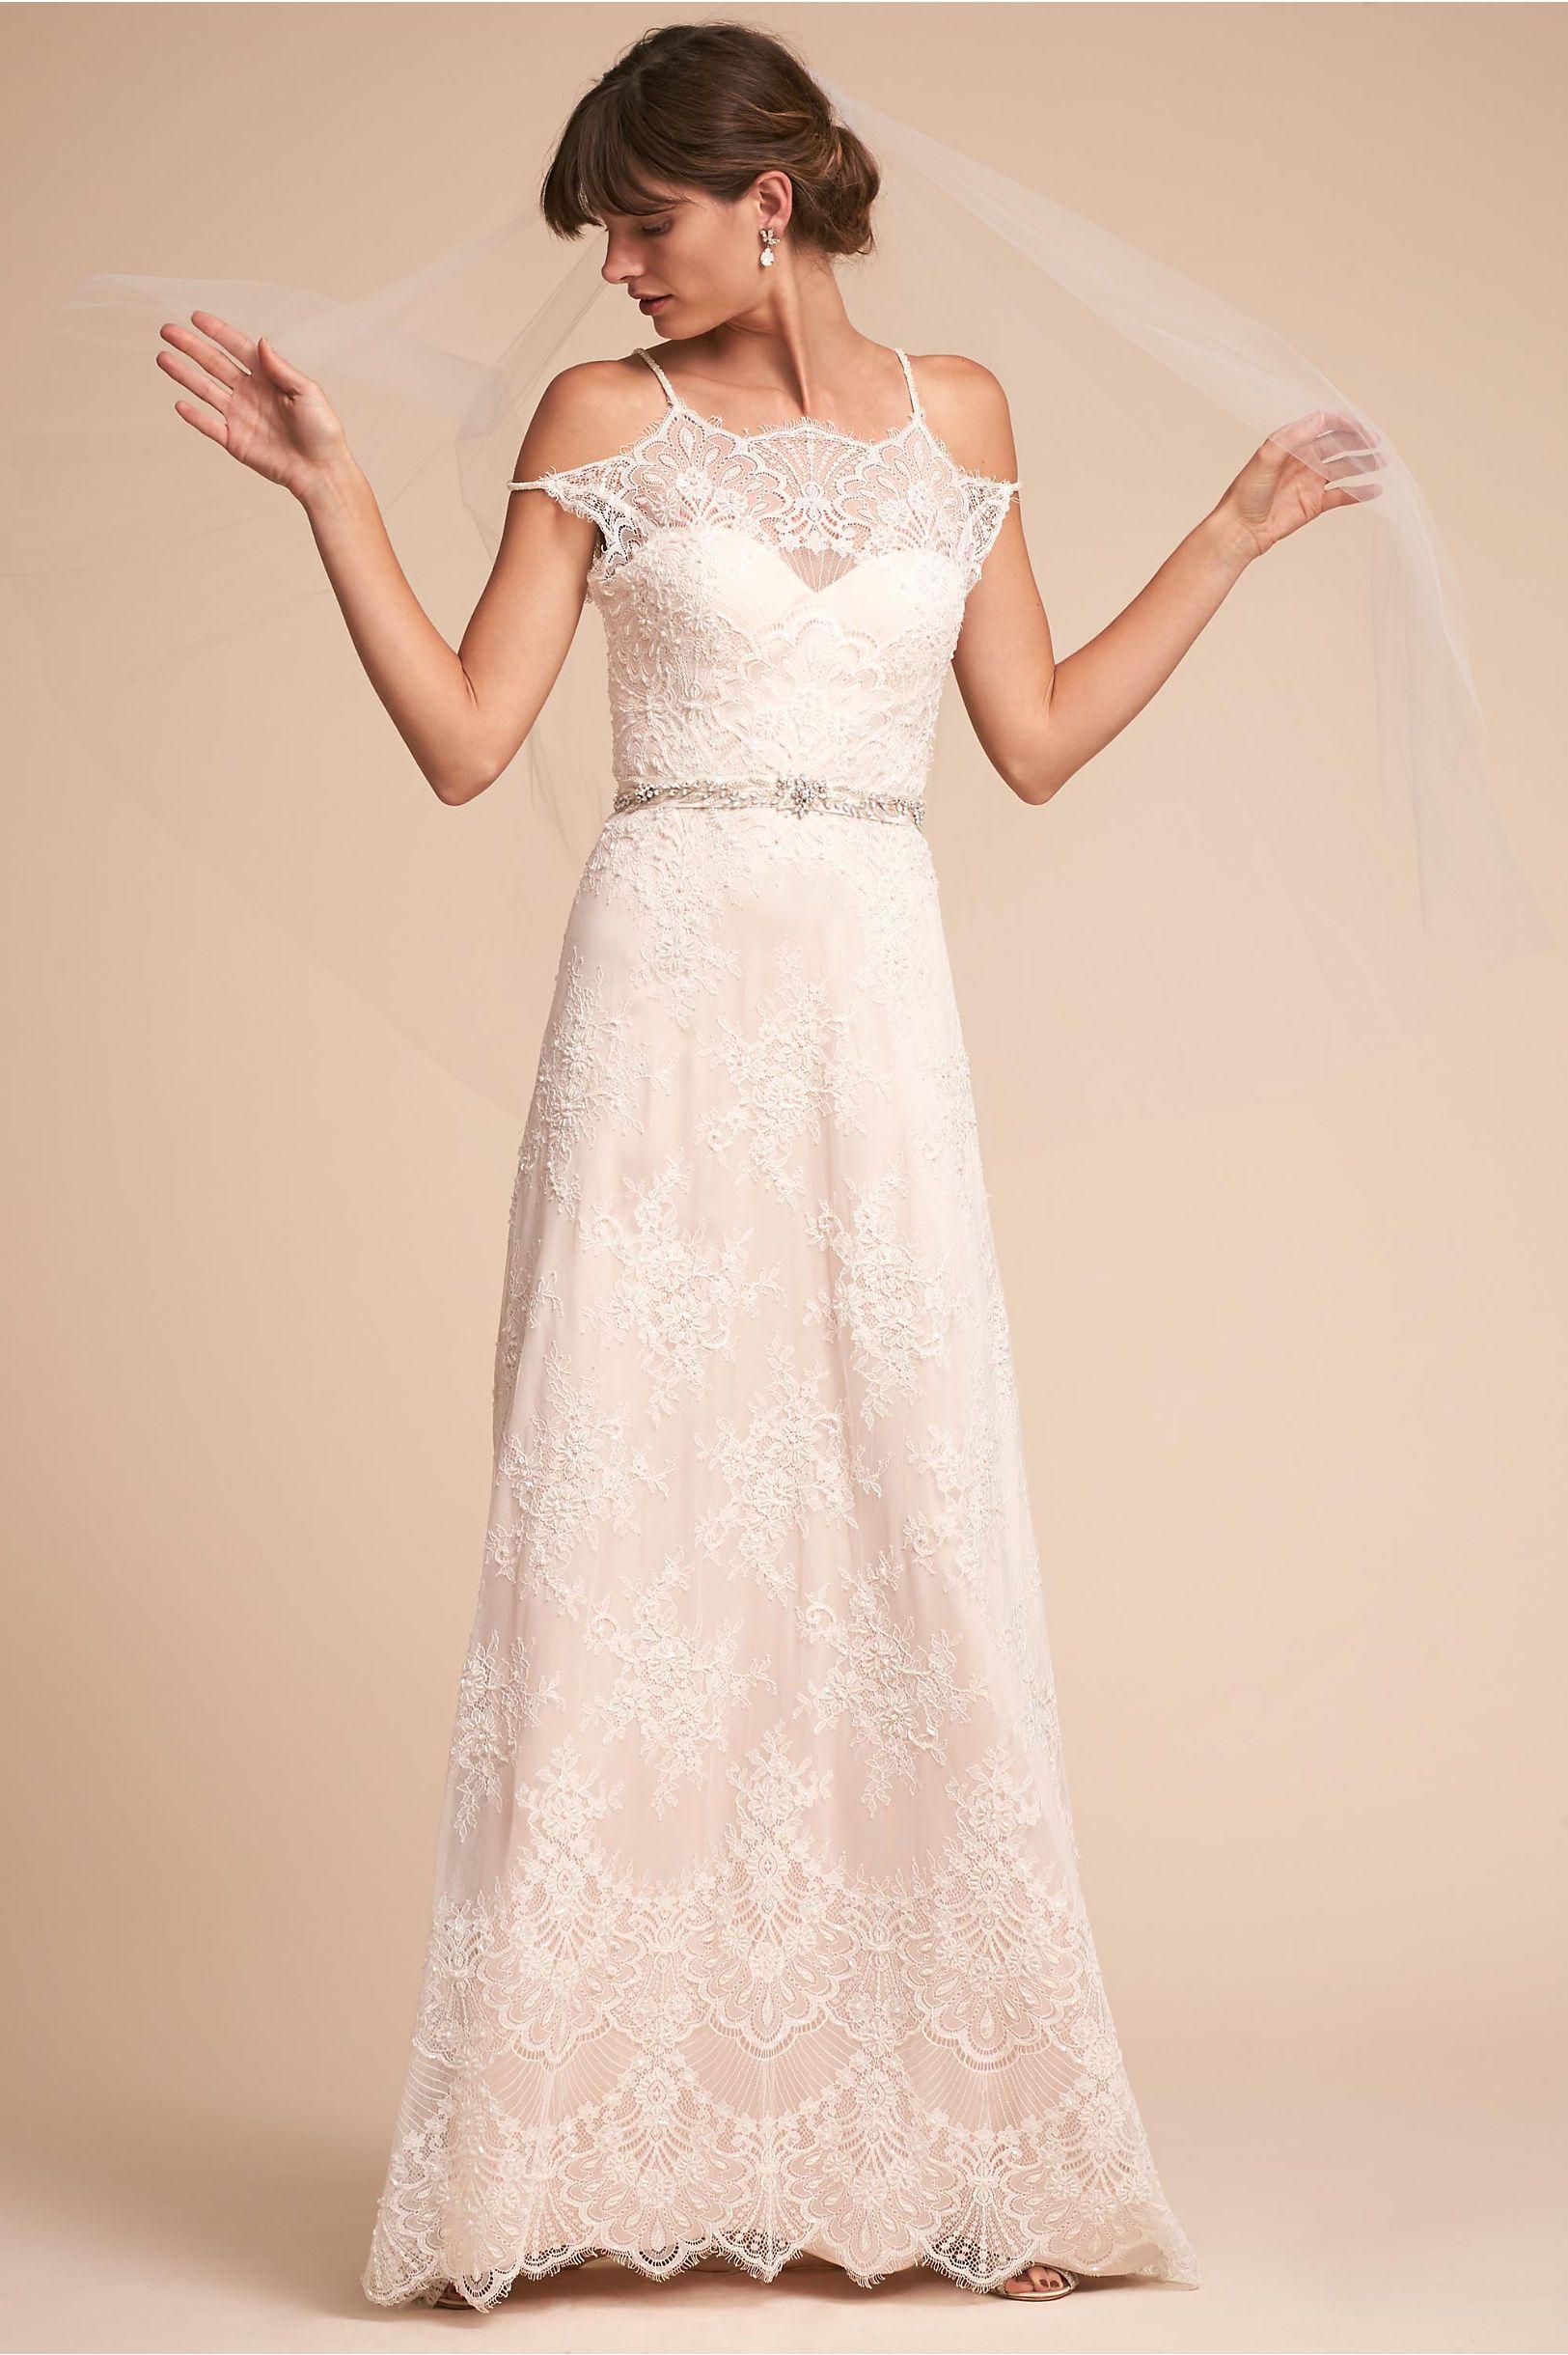 Lace wedding dress champagne  BHLDN Karla Gown Ivory in Bride  BHLDN  Wedding Dress  Pinterest